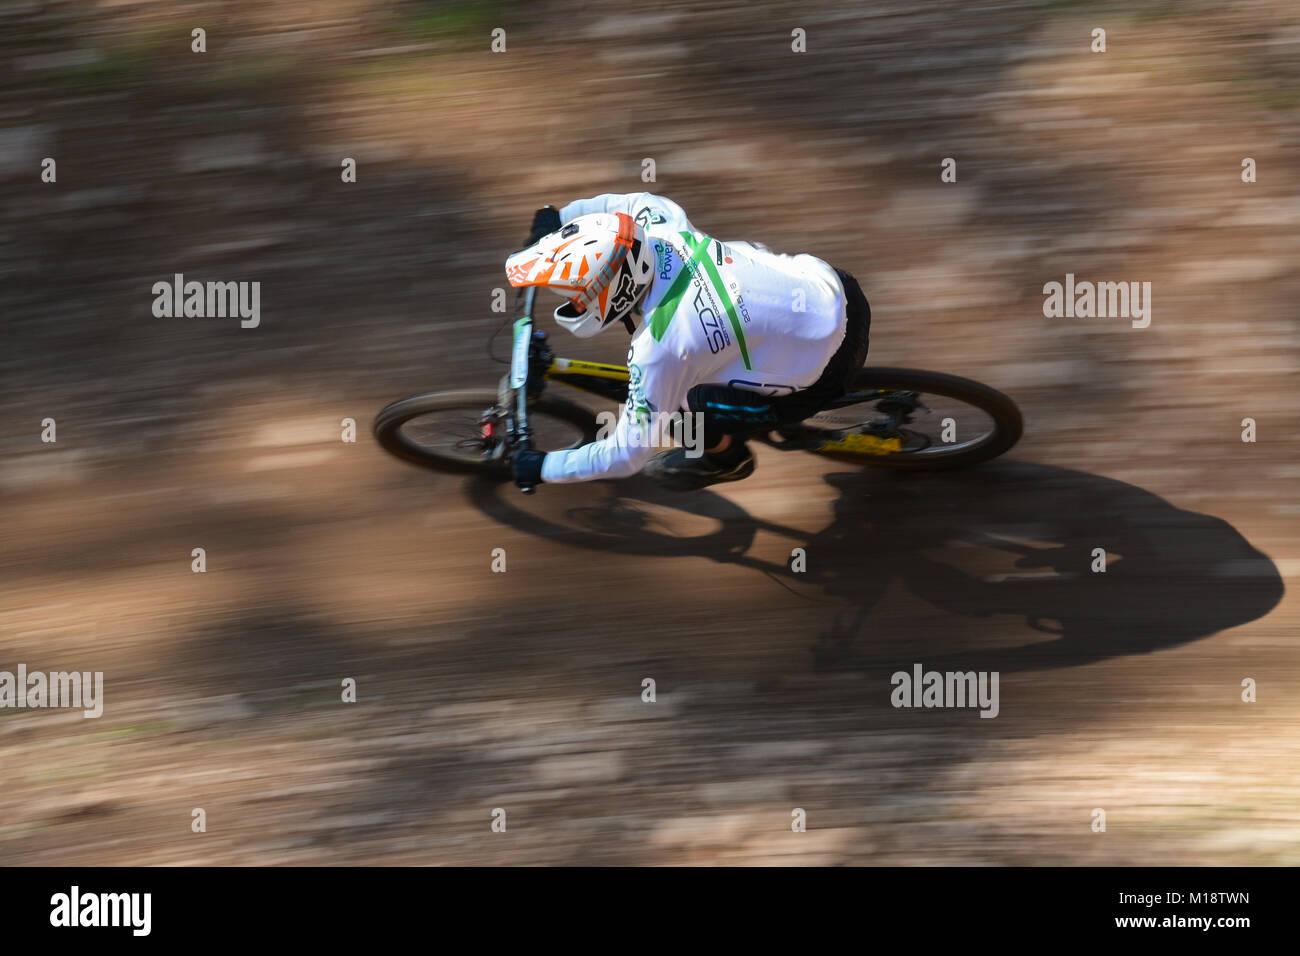 Downhill mountain biker with SDA Academy shirt - Stock Image